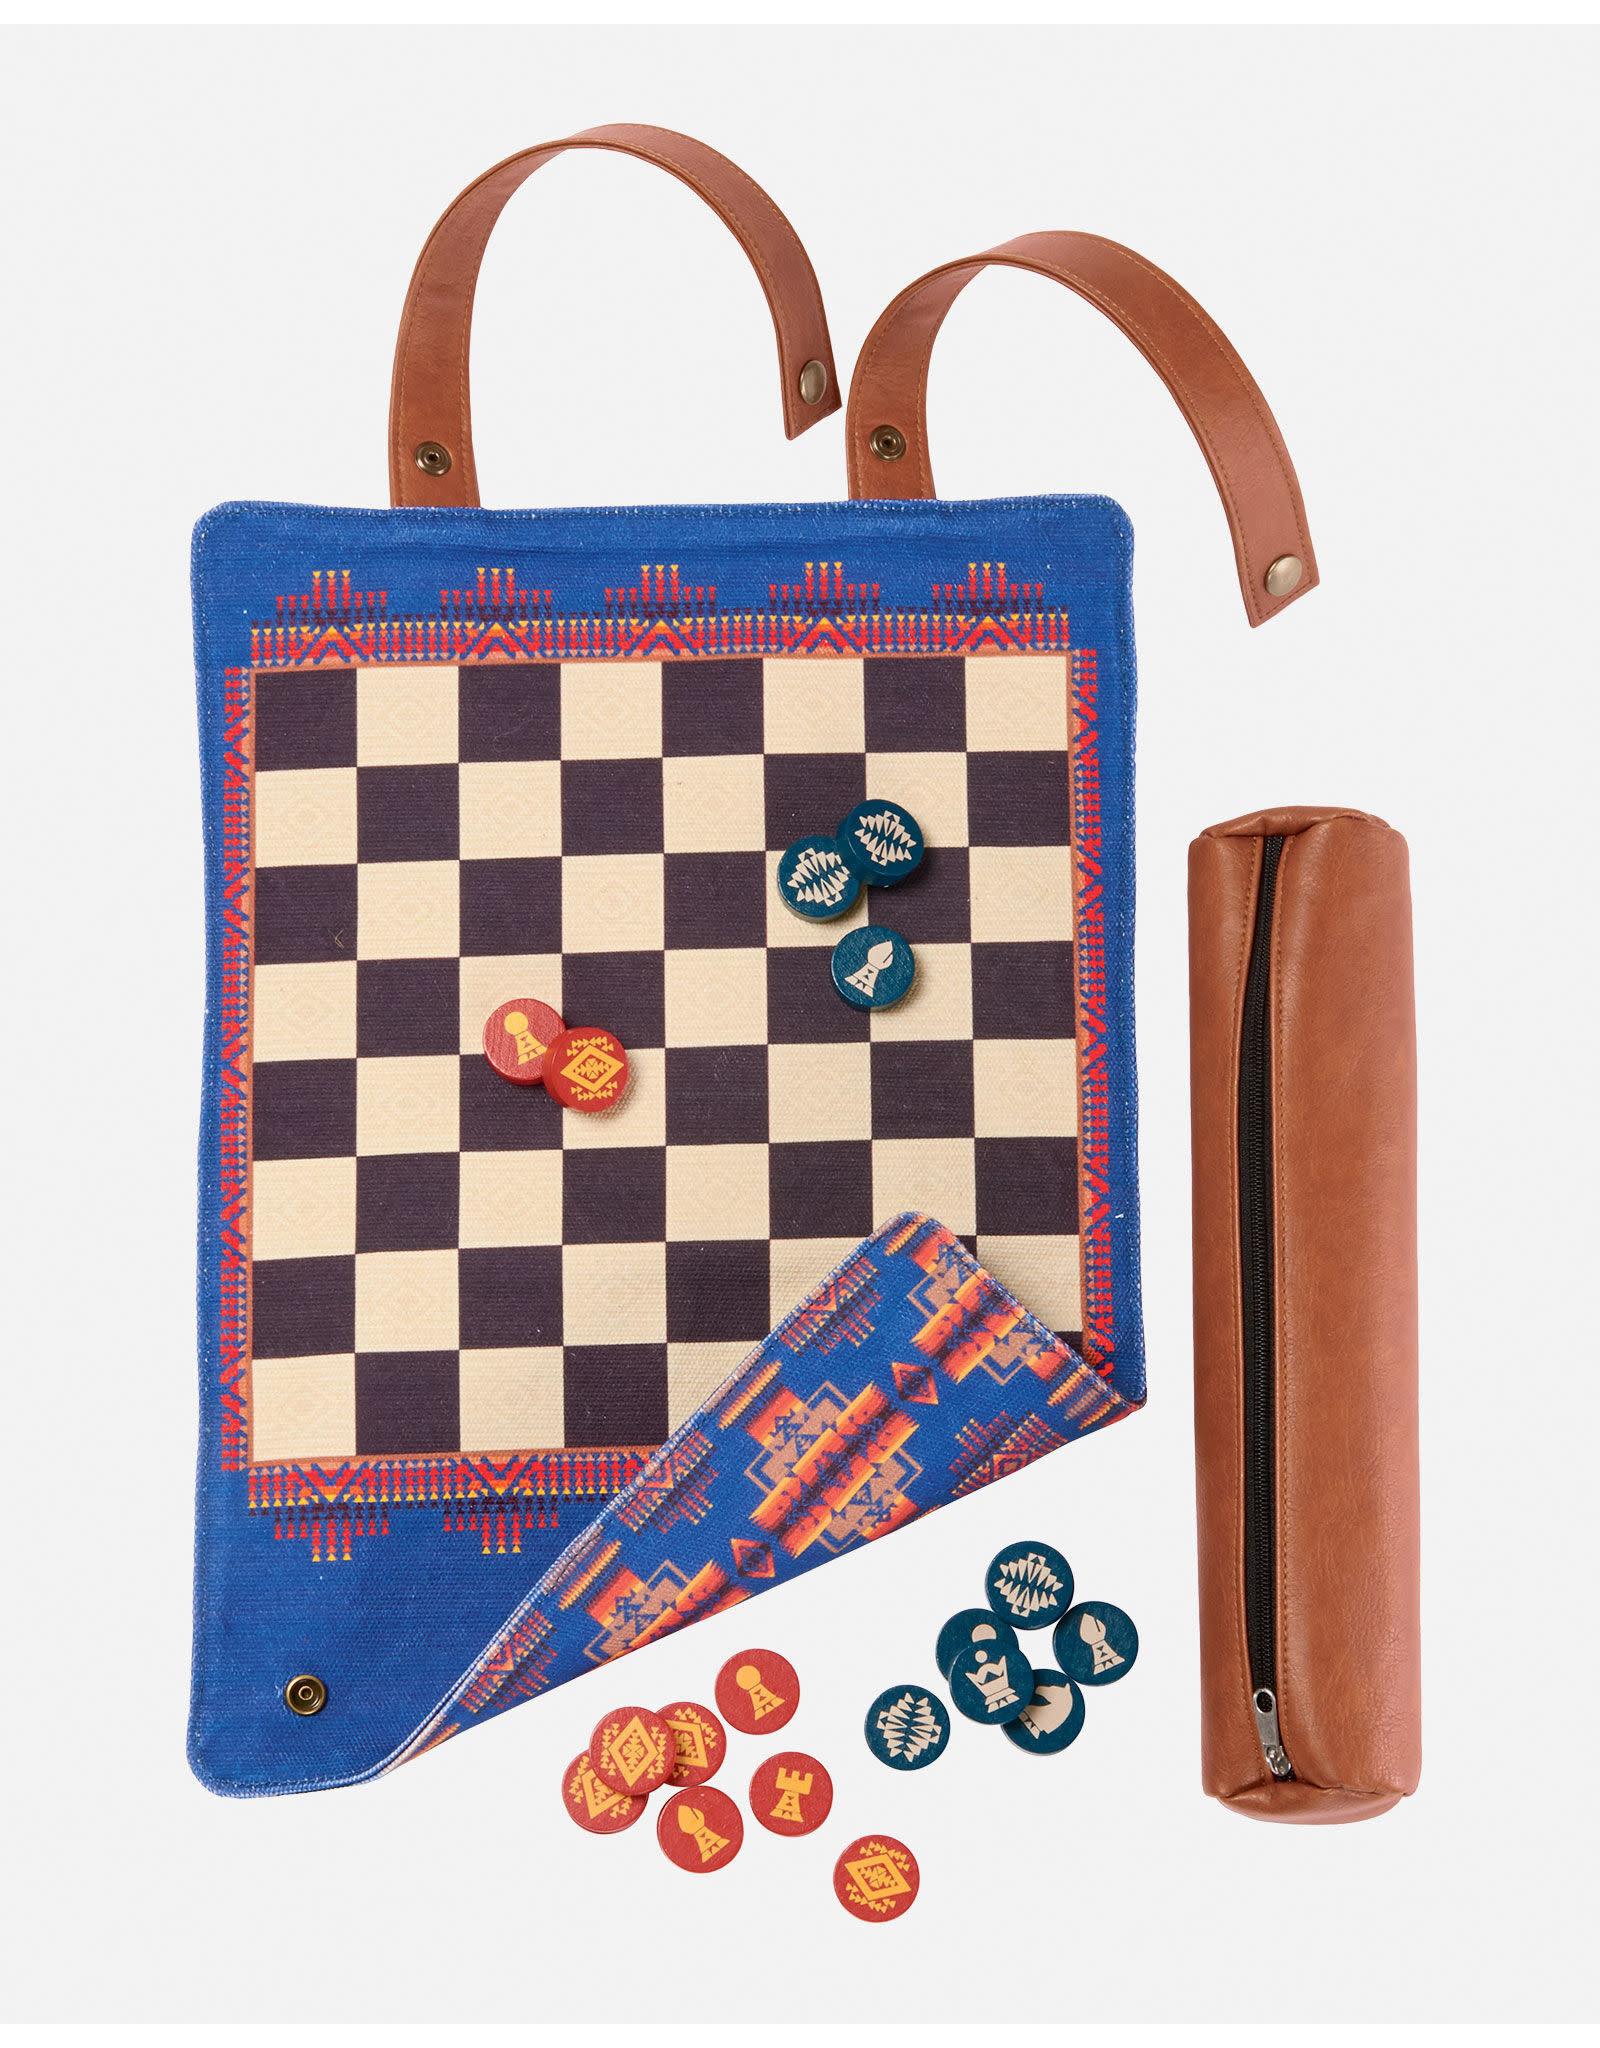 Pendleton Chess & Checkers Set Pendleton Roll-Up